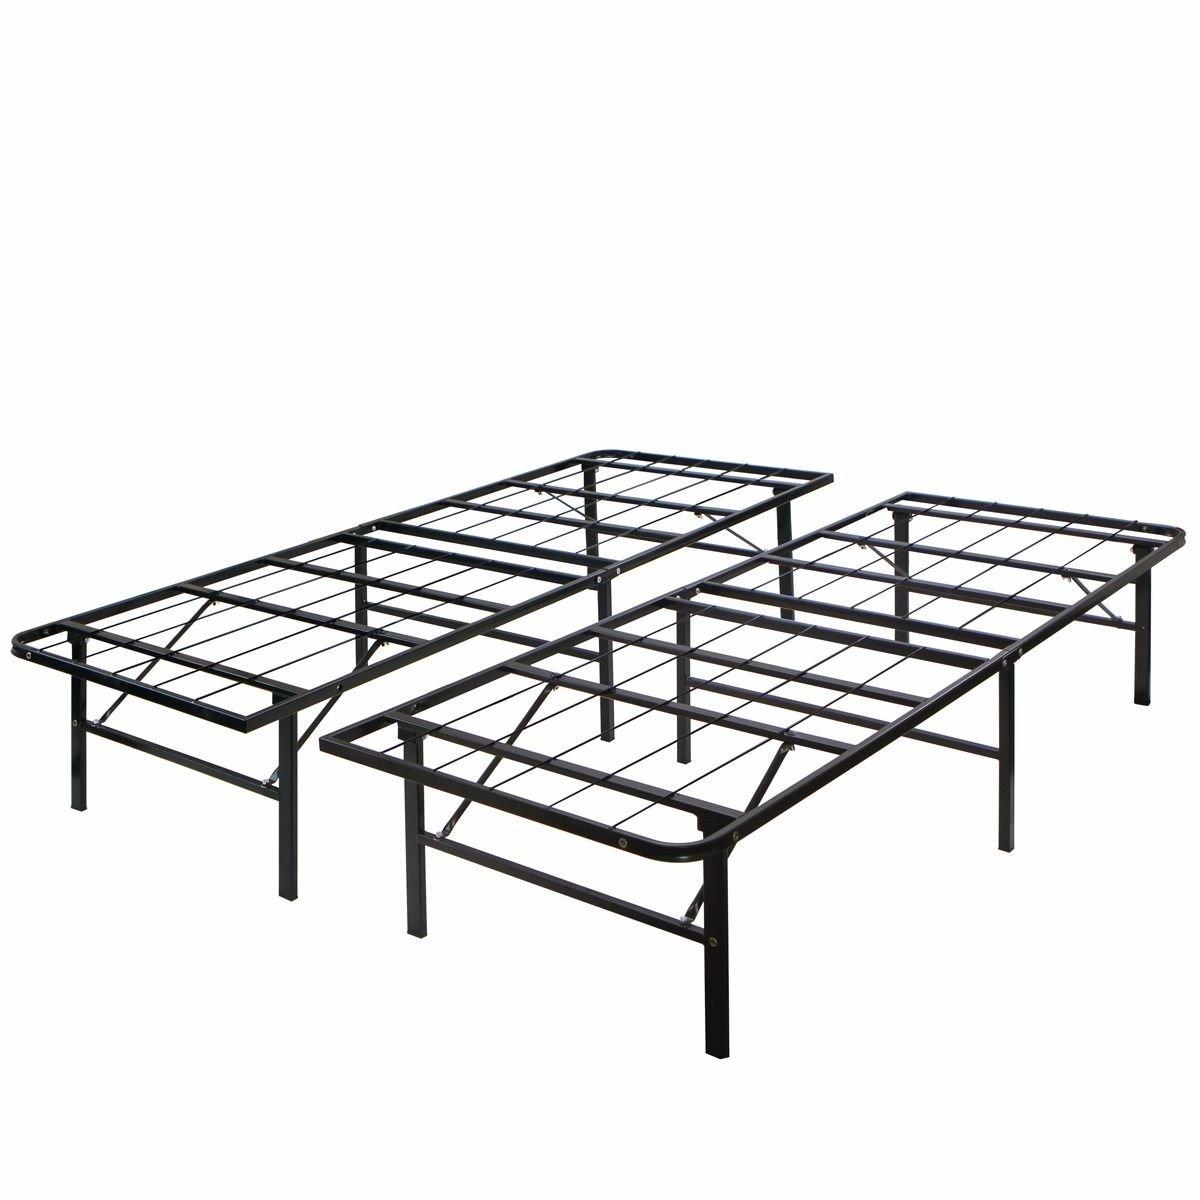 New Modern king Size Bi-Fold Folding Platform Metal Bed Frame Mattress Foundation